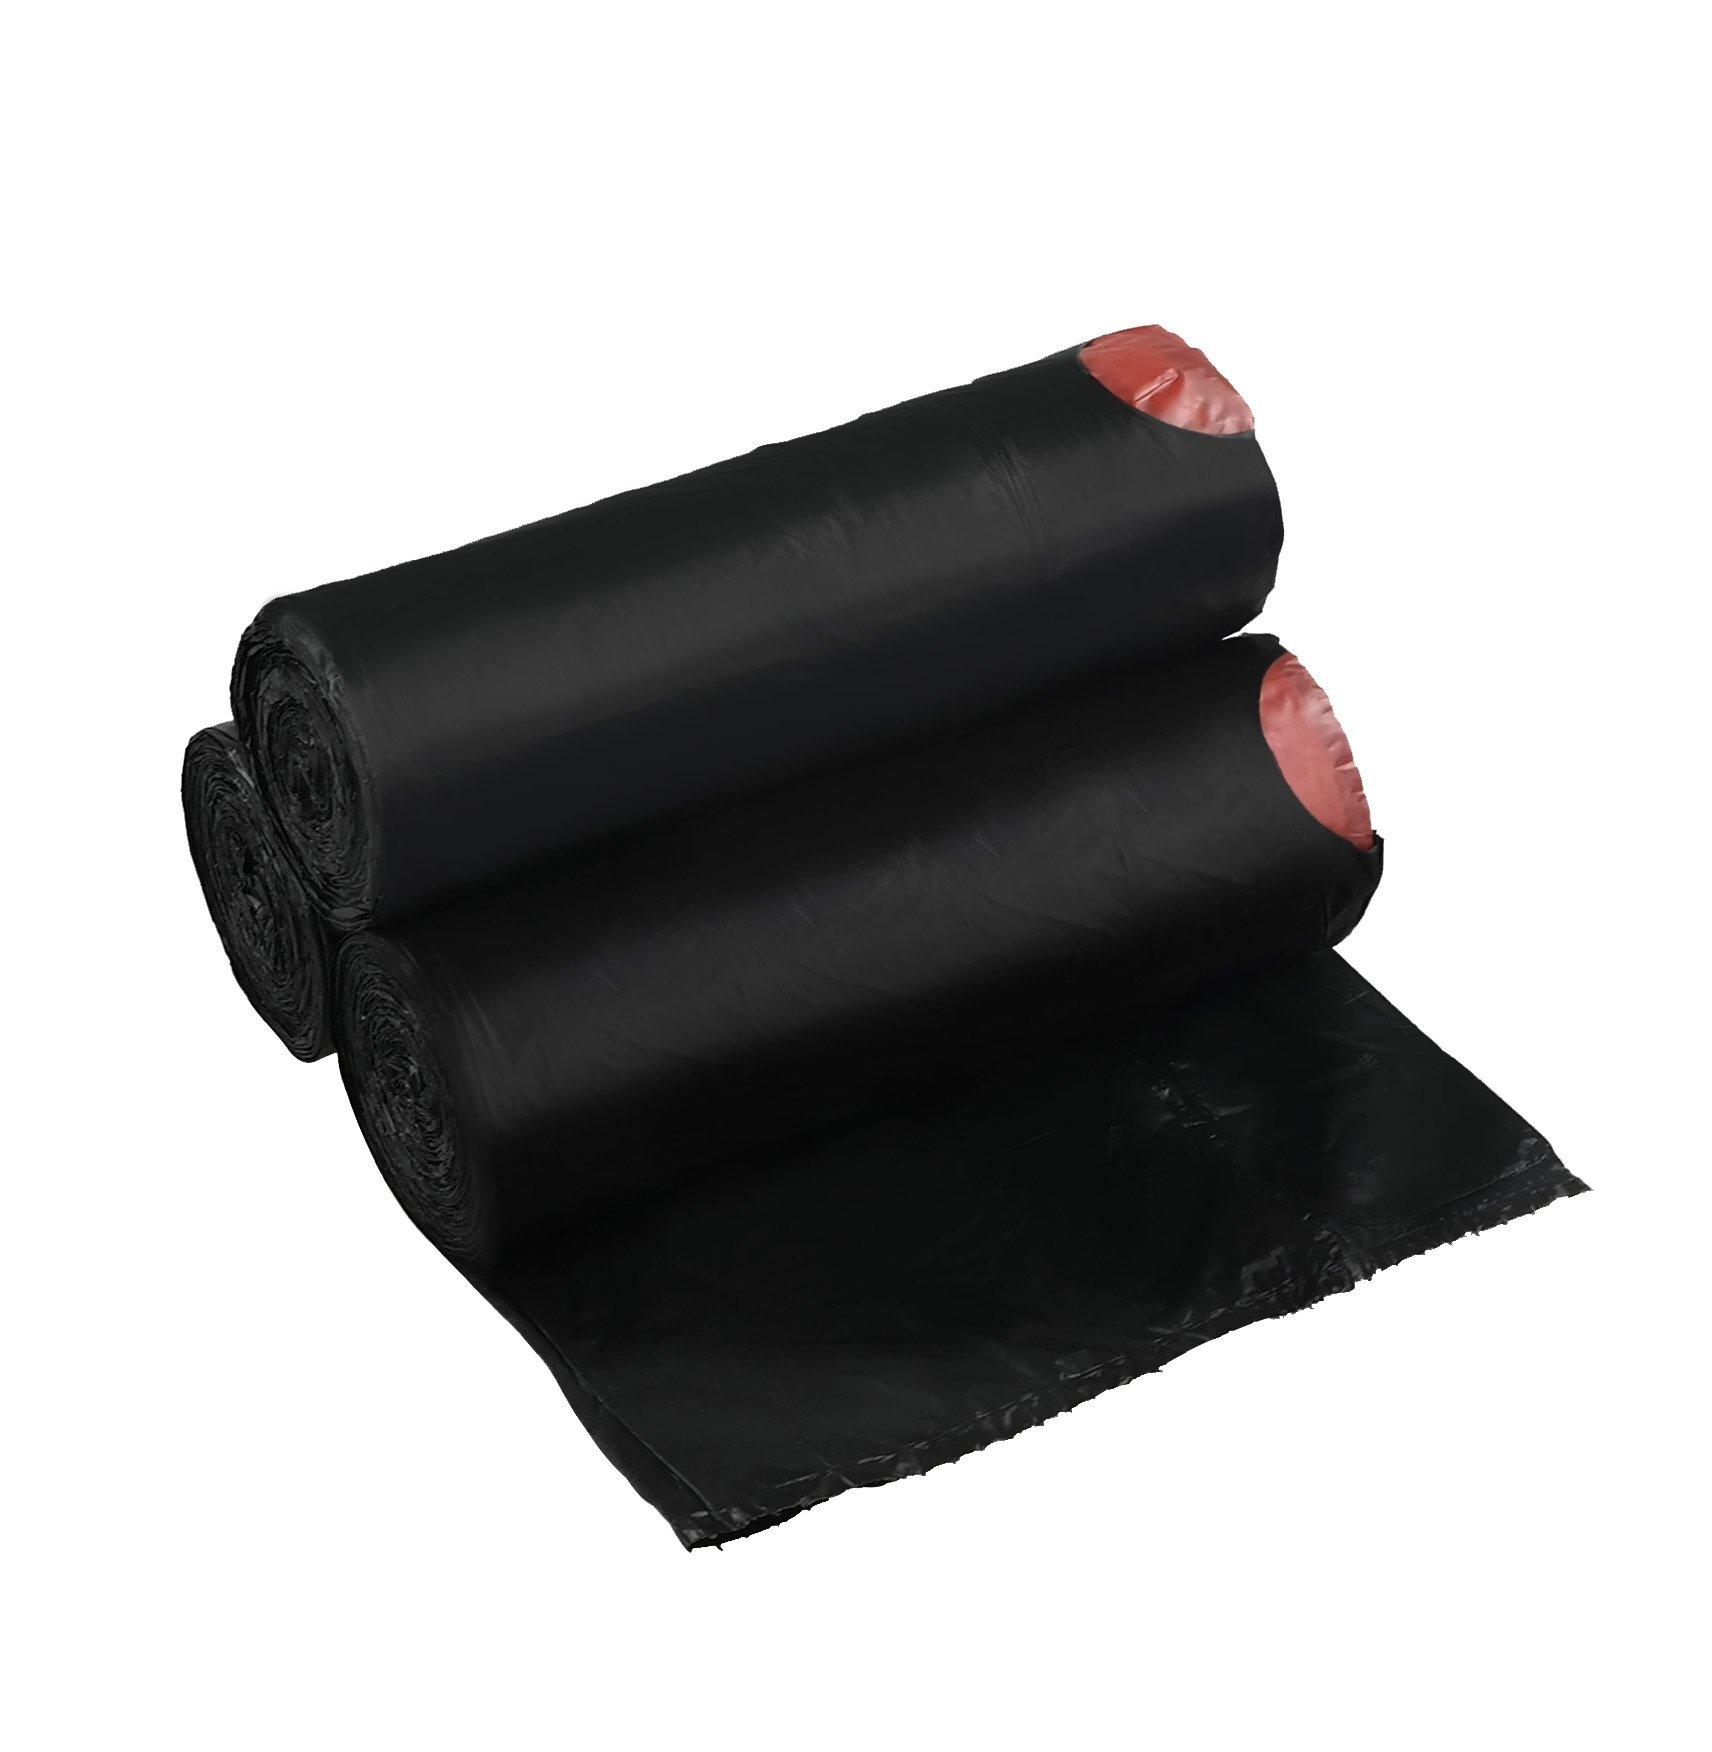 Begale 3 Gallon Drawstring Trash Bags, Black, 110 Counts/3 Rolls